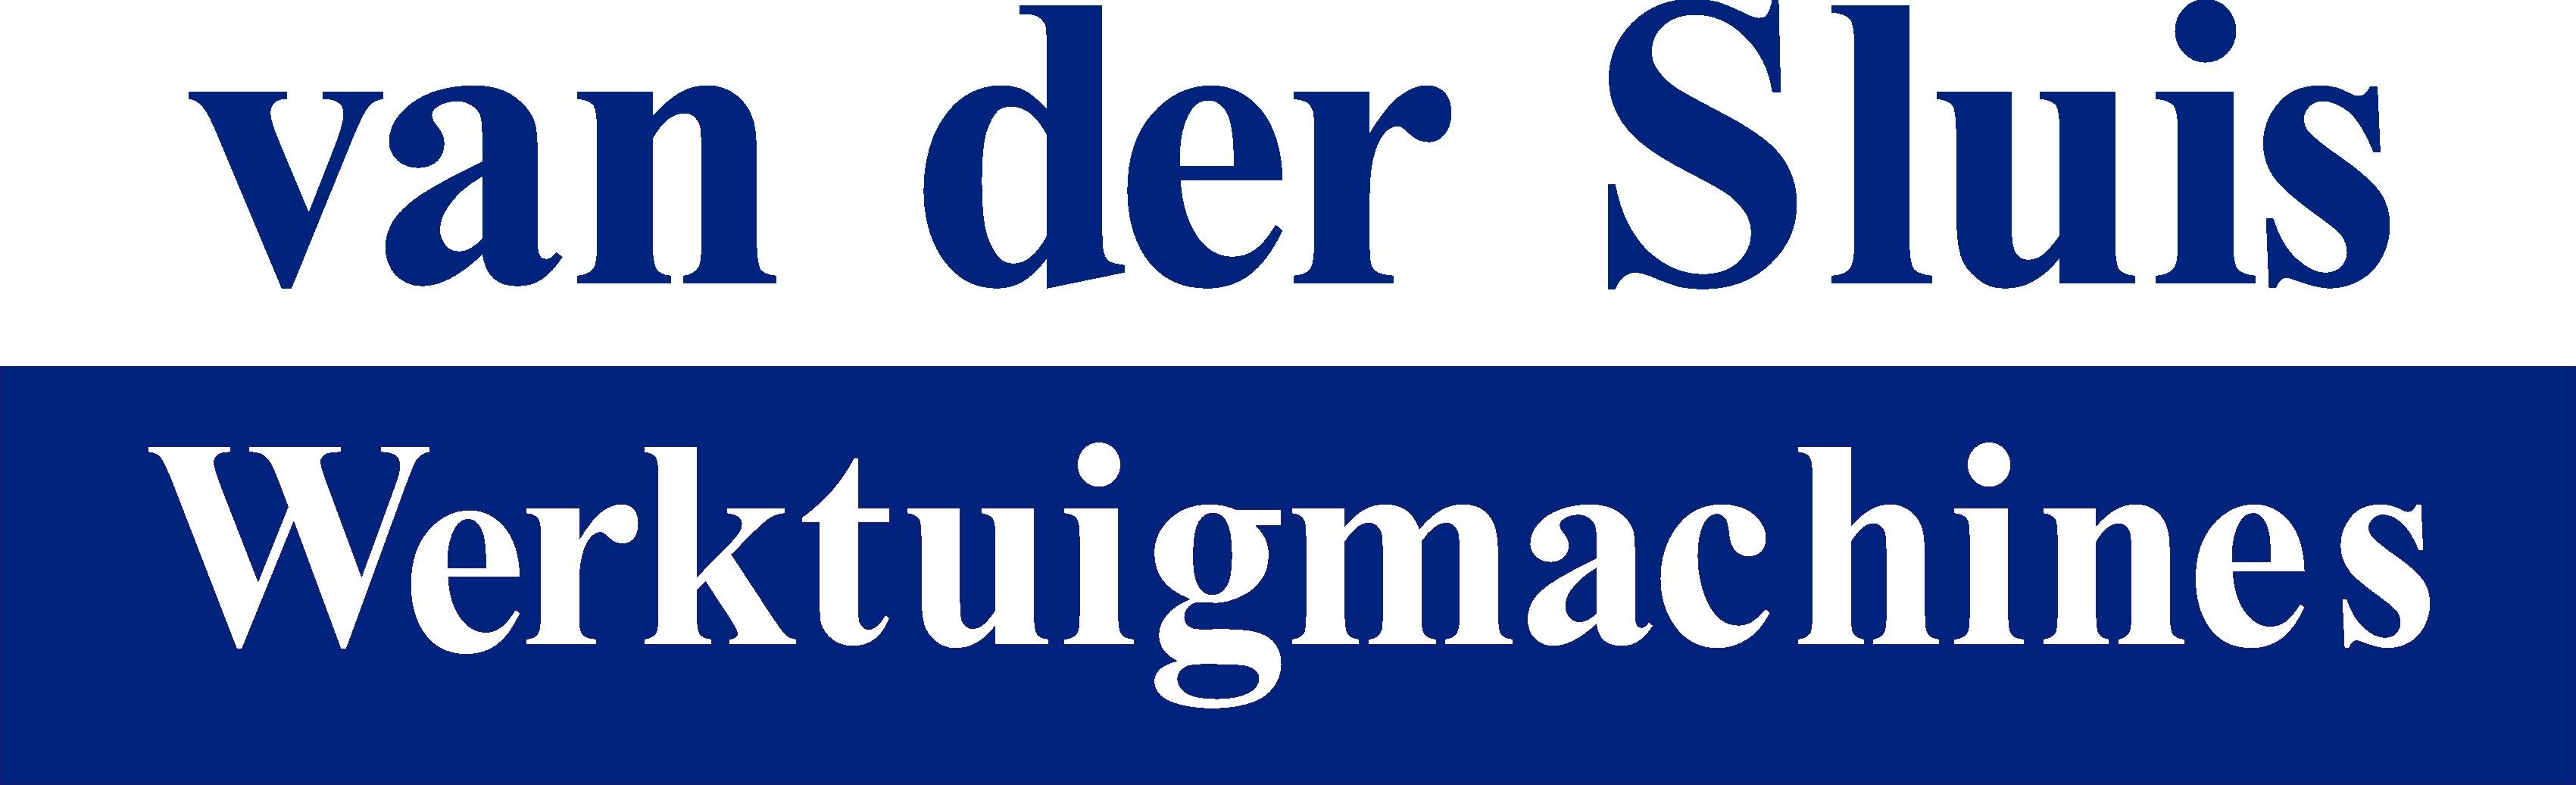 logo van der sluis zonder www.jpg